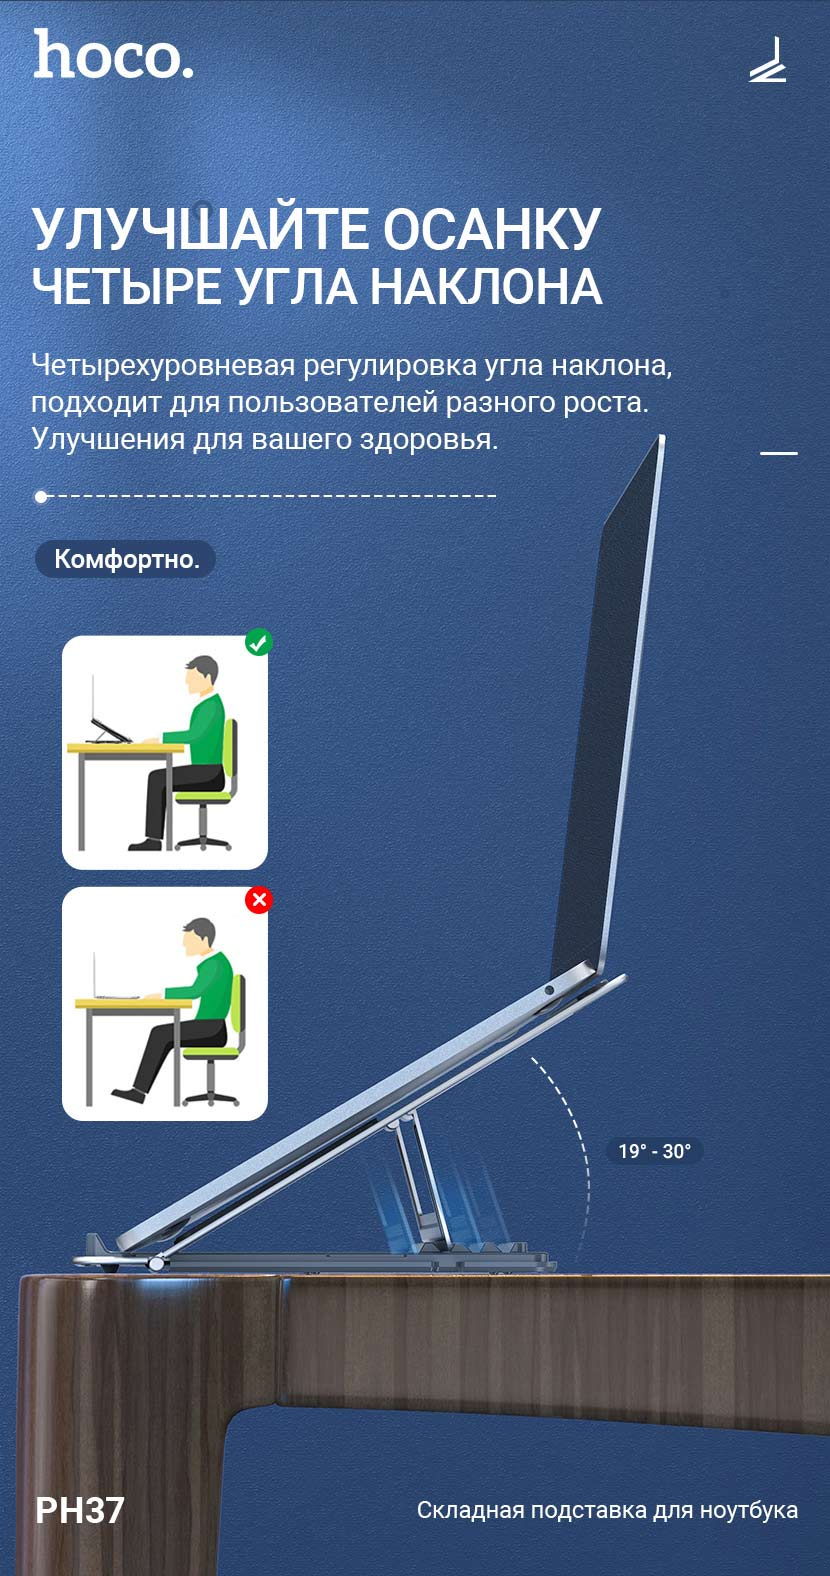 hoco news ph37 excellent aluminum alloy folding laptop stand adjustment ru